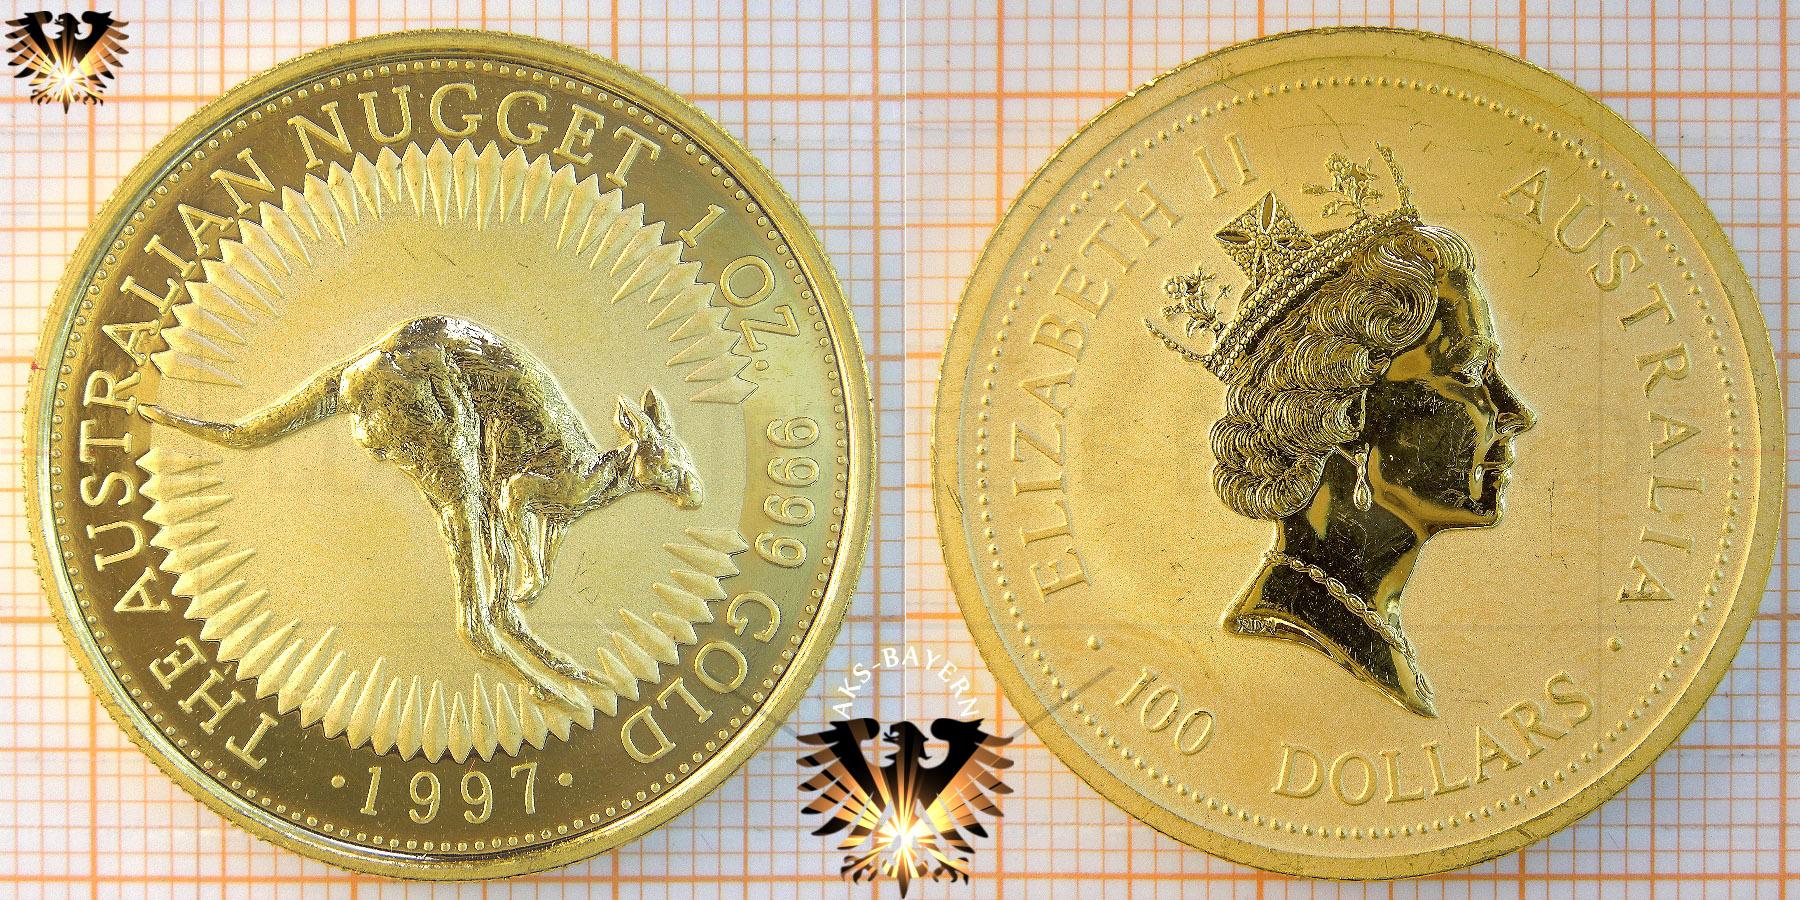 Bullionmünze: AUS, 100 Dollars, 1997, Australian Nugget, Kangaroo, 1oz © goldankaufstelle-bayern.de